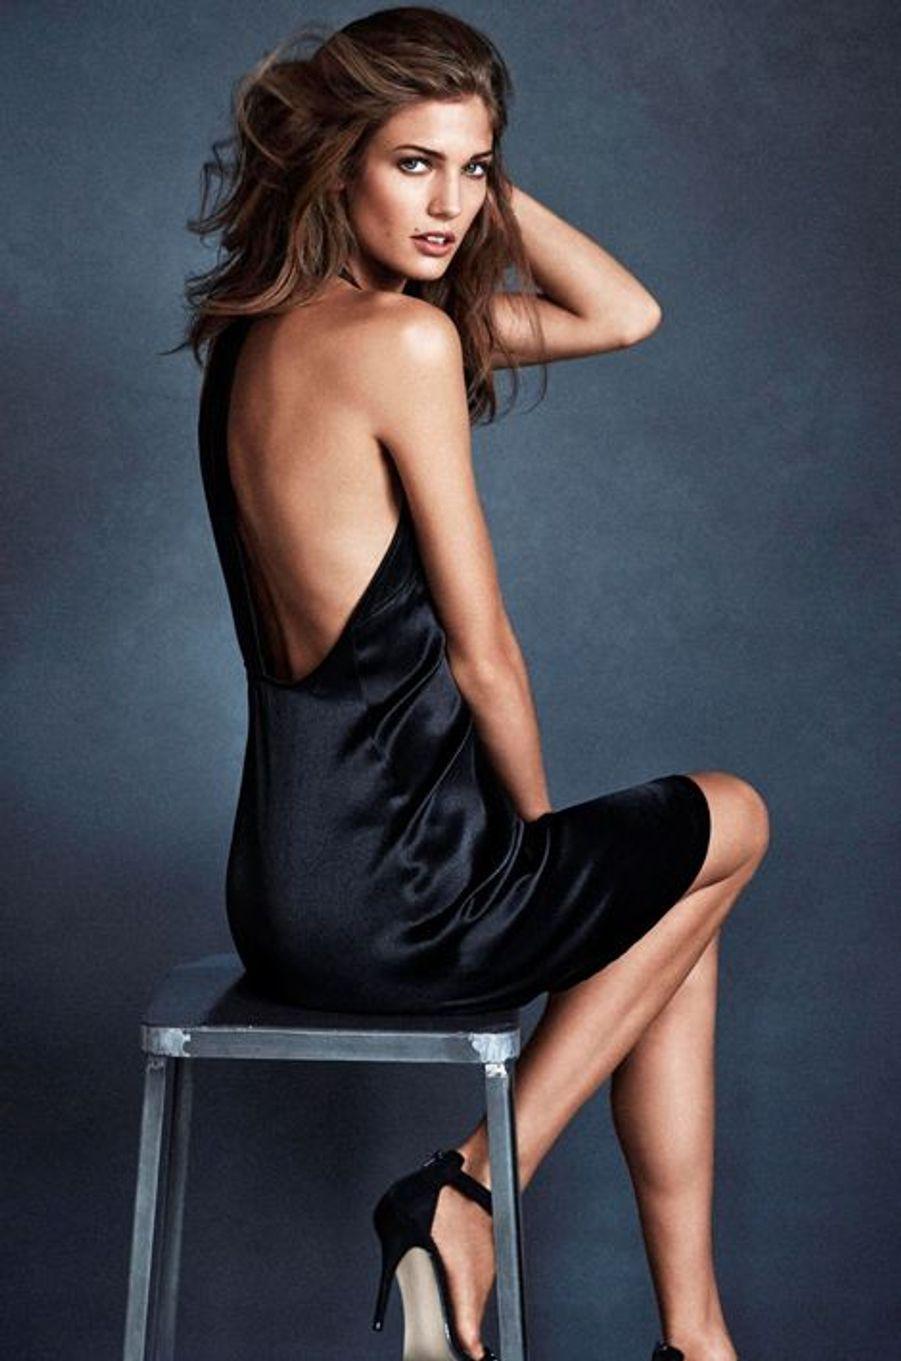 Kendra Spears, princesse modèle